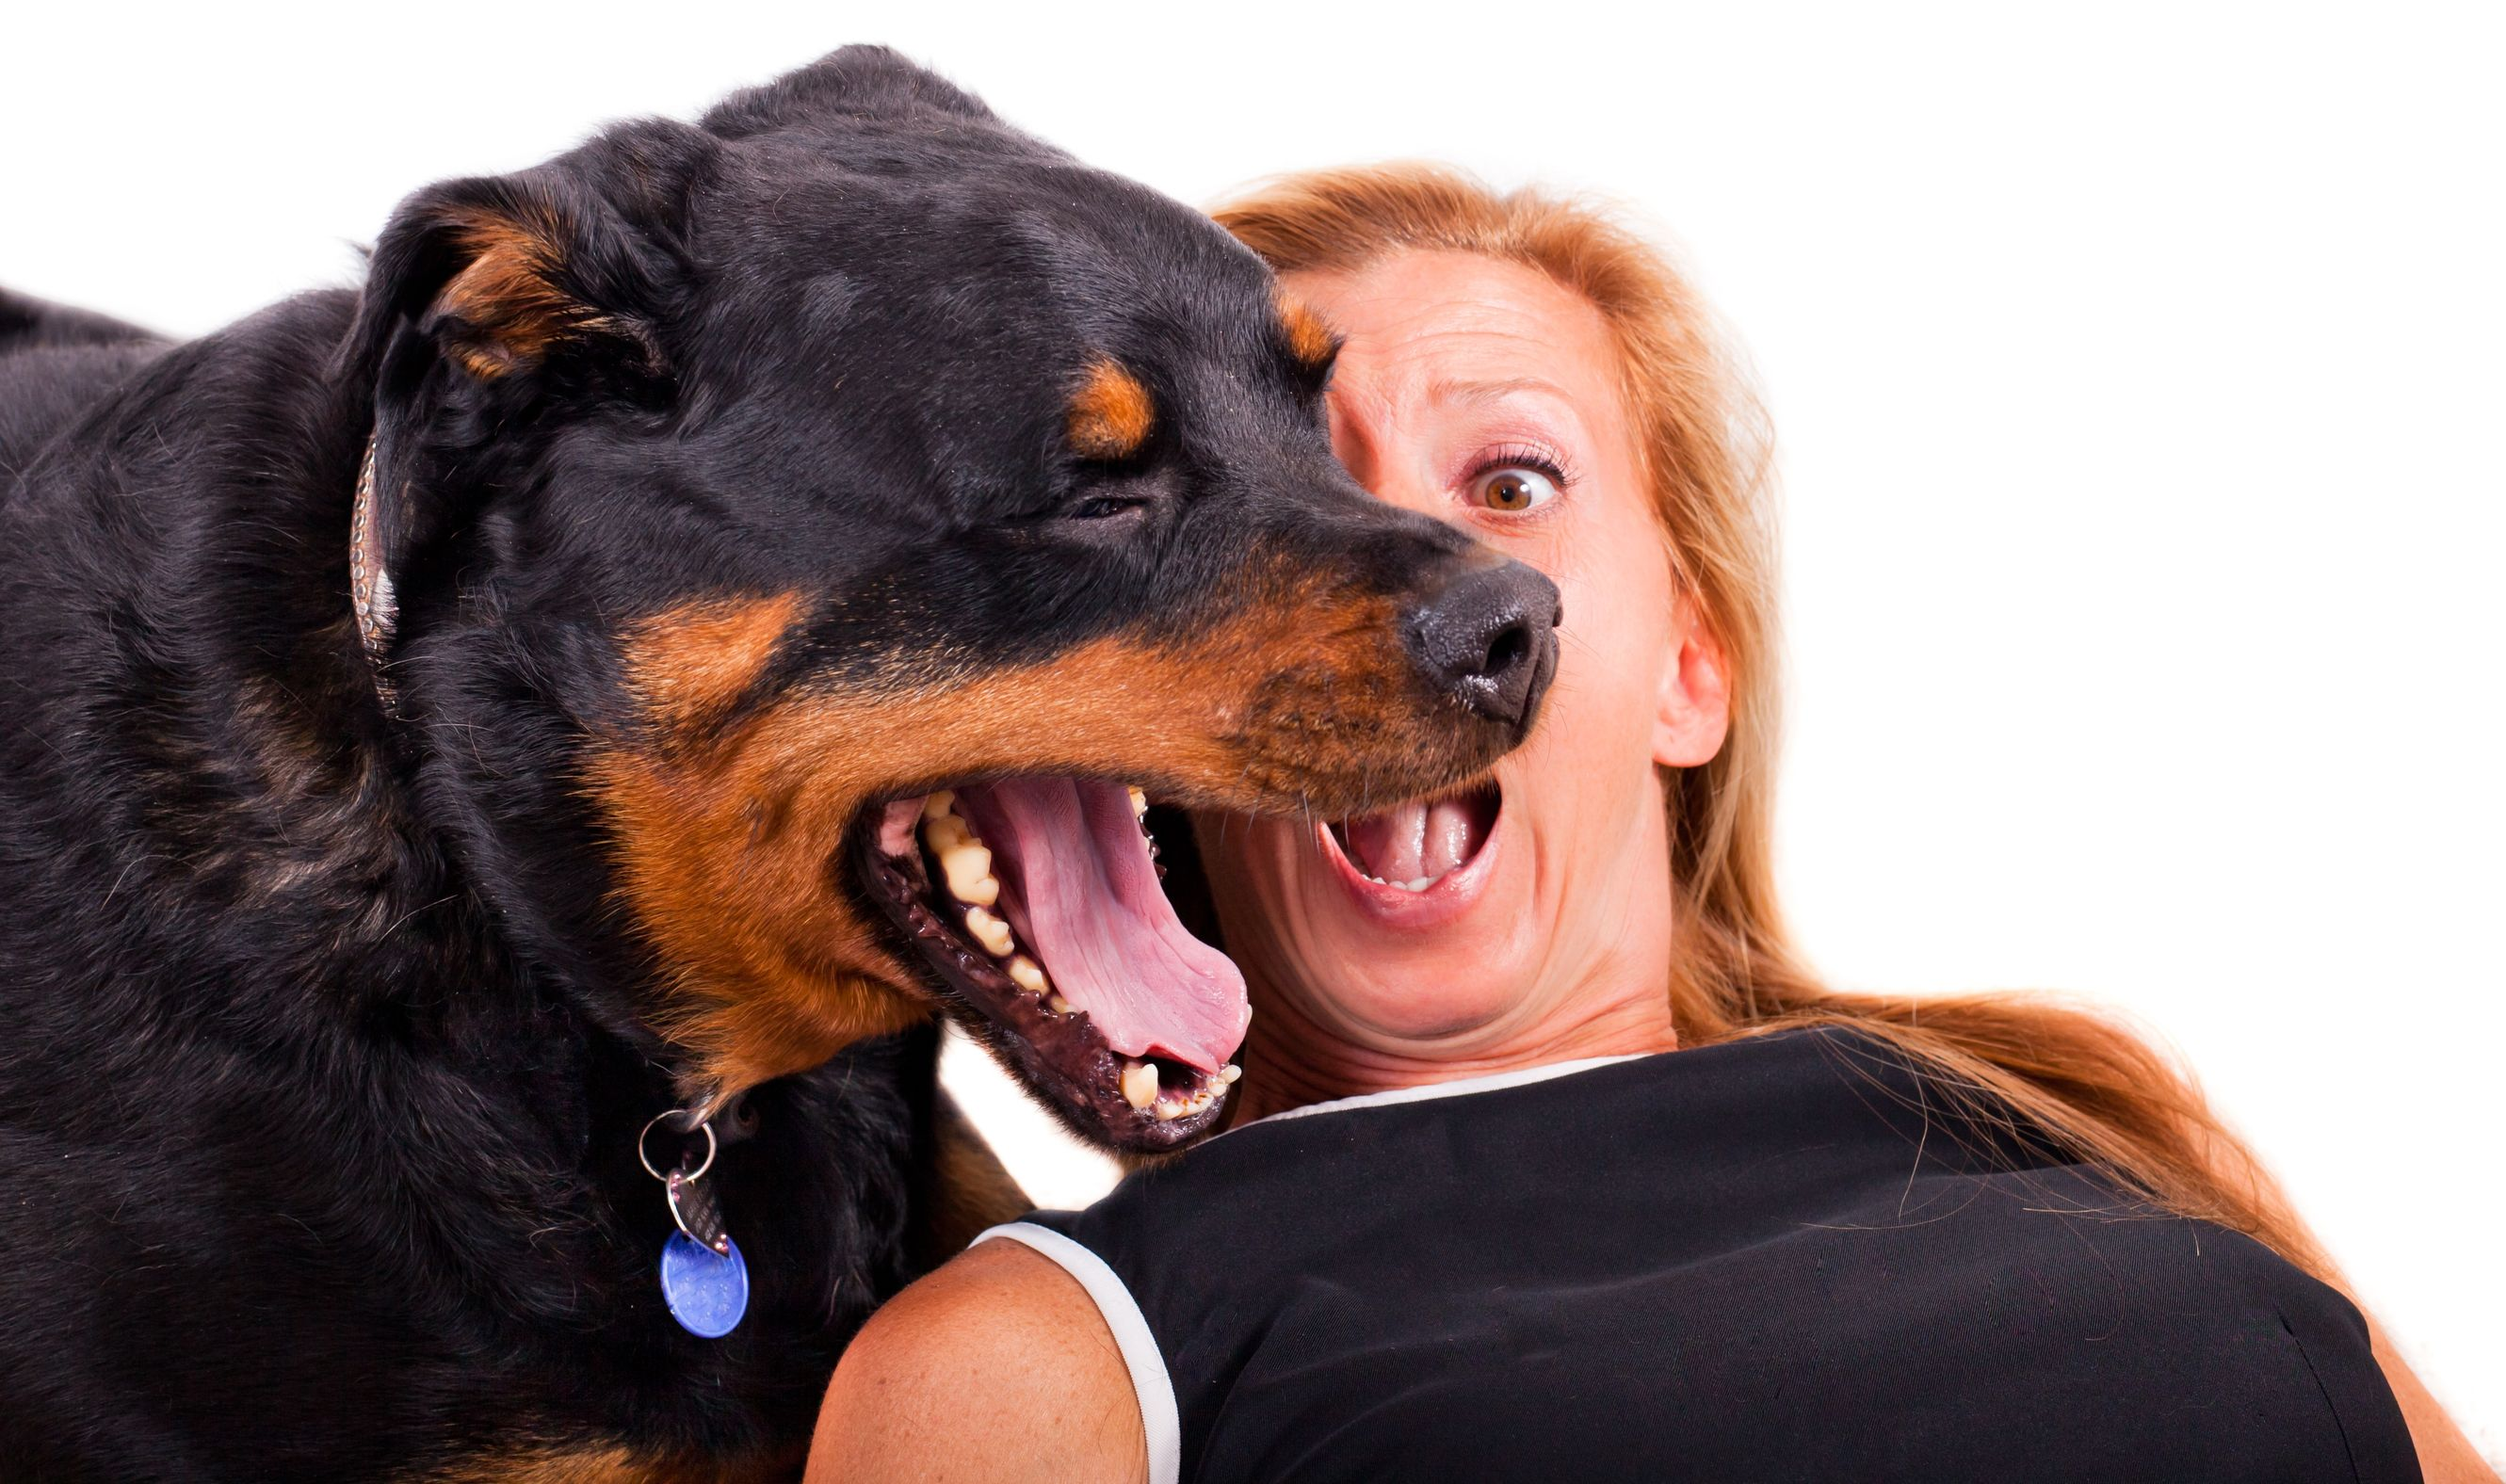 dog's breath smells like fish   Ultimate Pet Nutrition